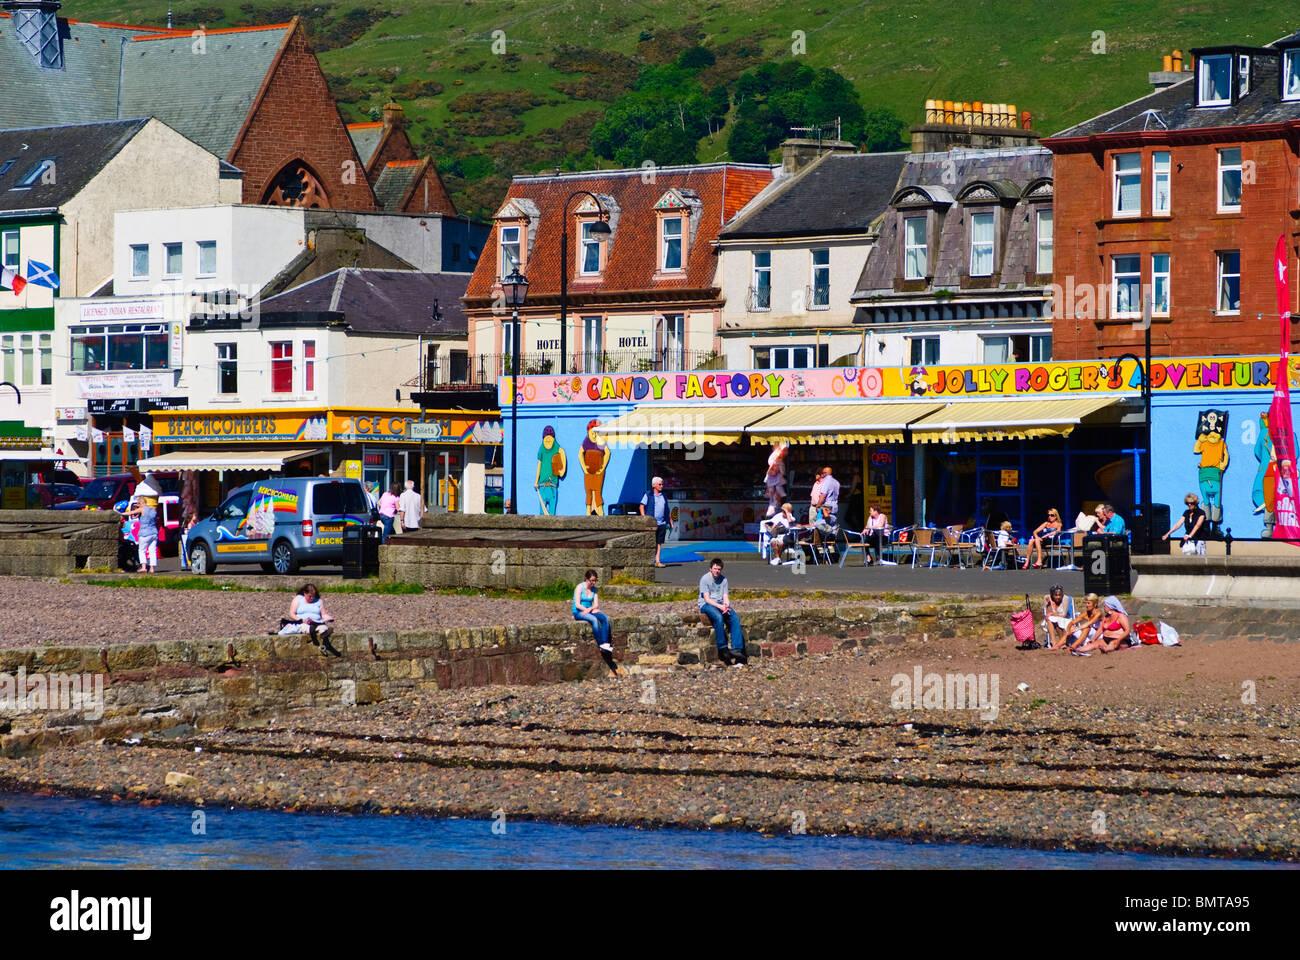 The Scottish seaside town of Largs Stock Photo: 30038433 - Alamy